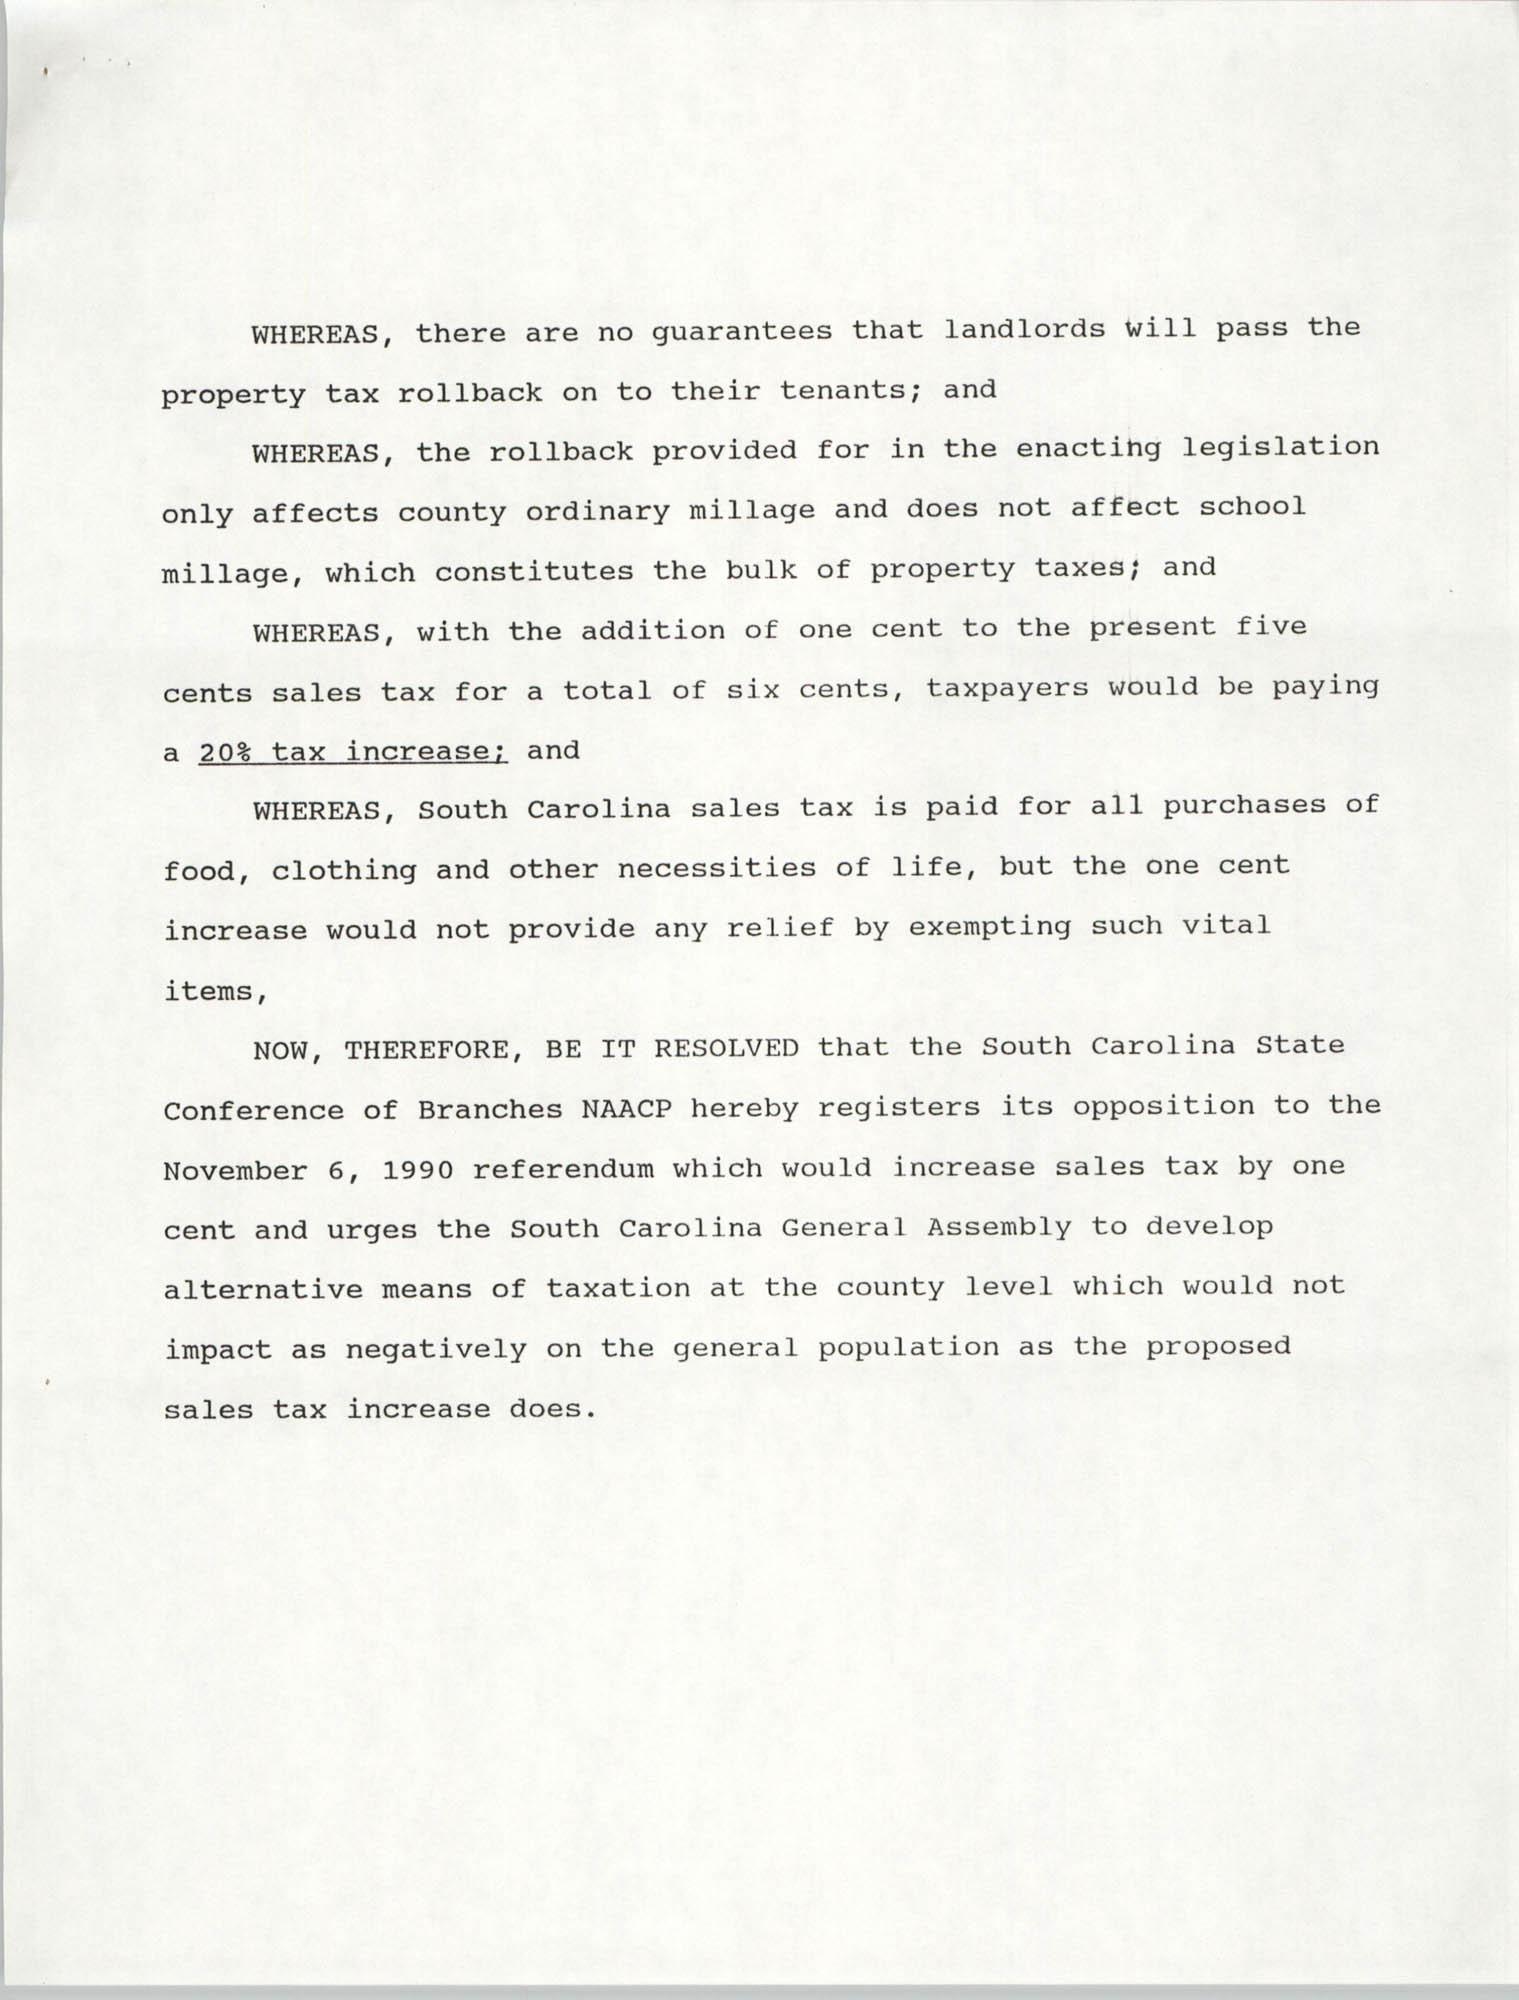 Local Option Sales Tax Referendum, Page 2